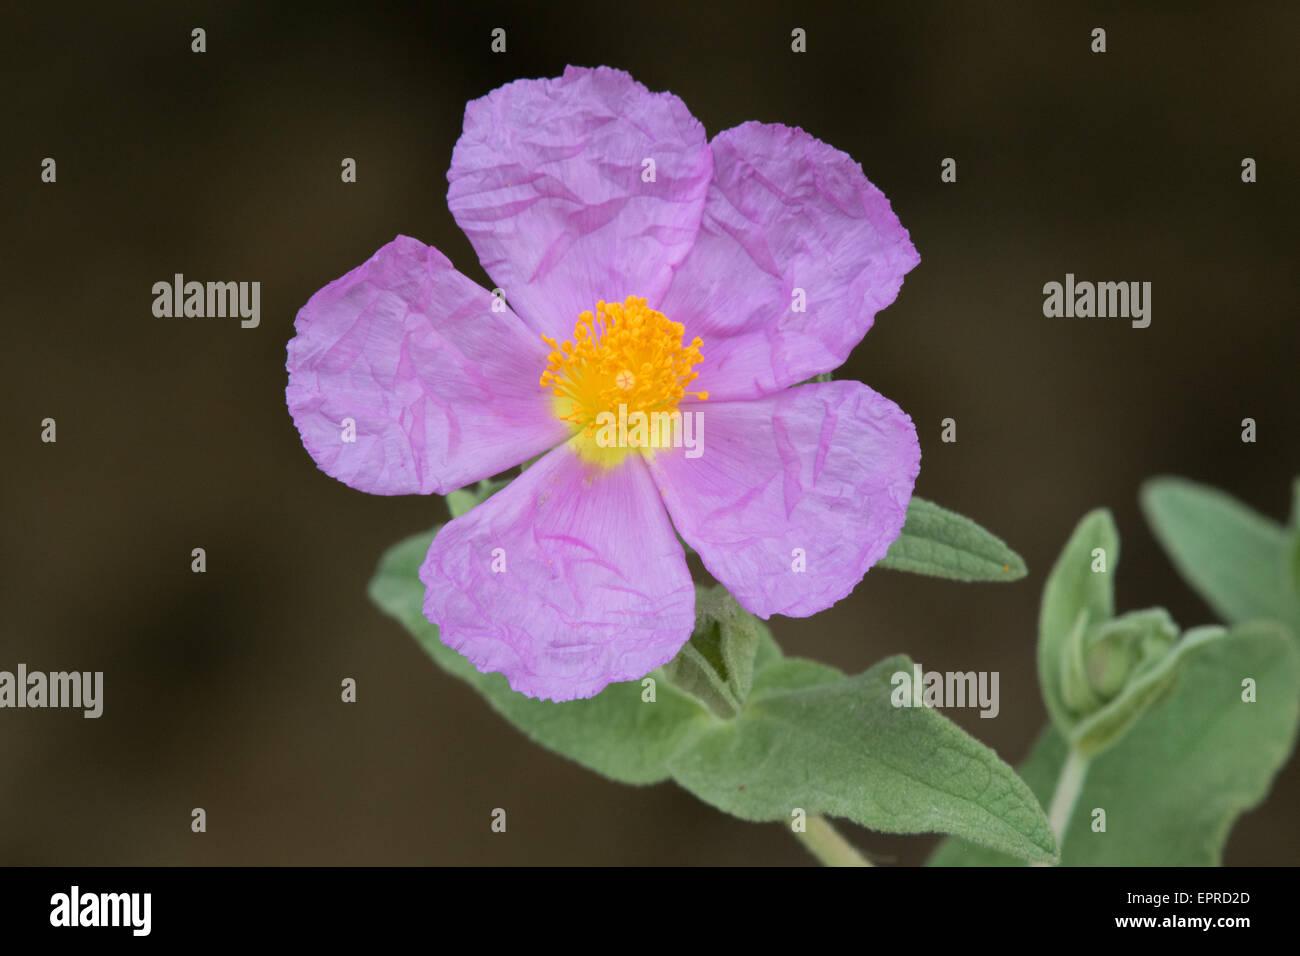 Grey-leaved Cistus (Cistus albidus) flower - Stock Image